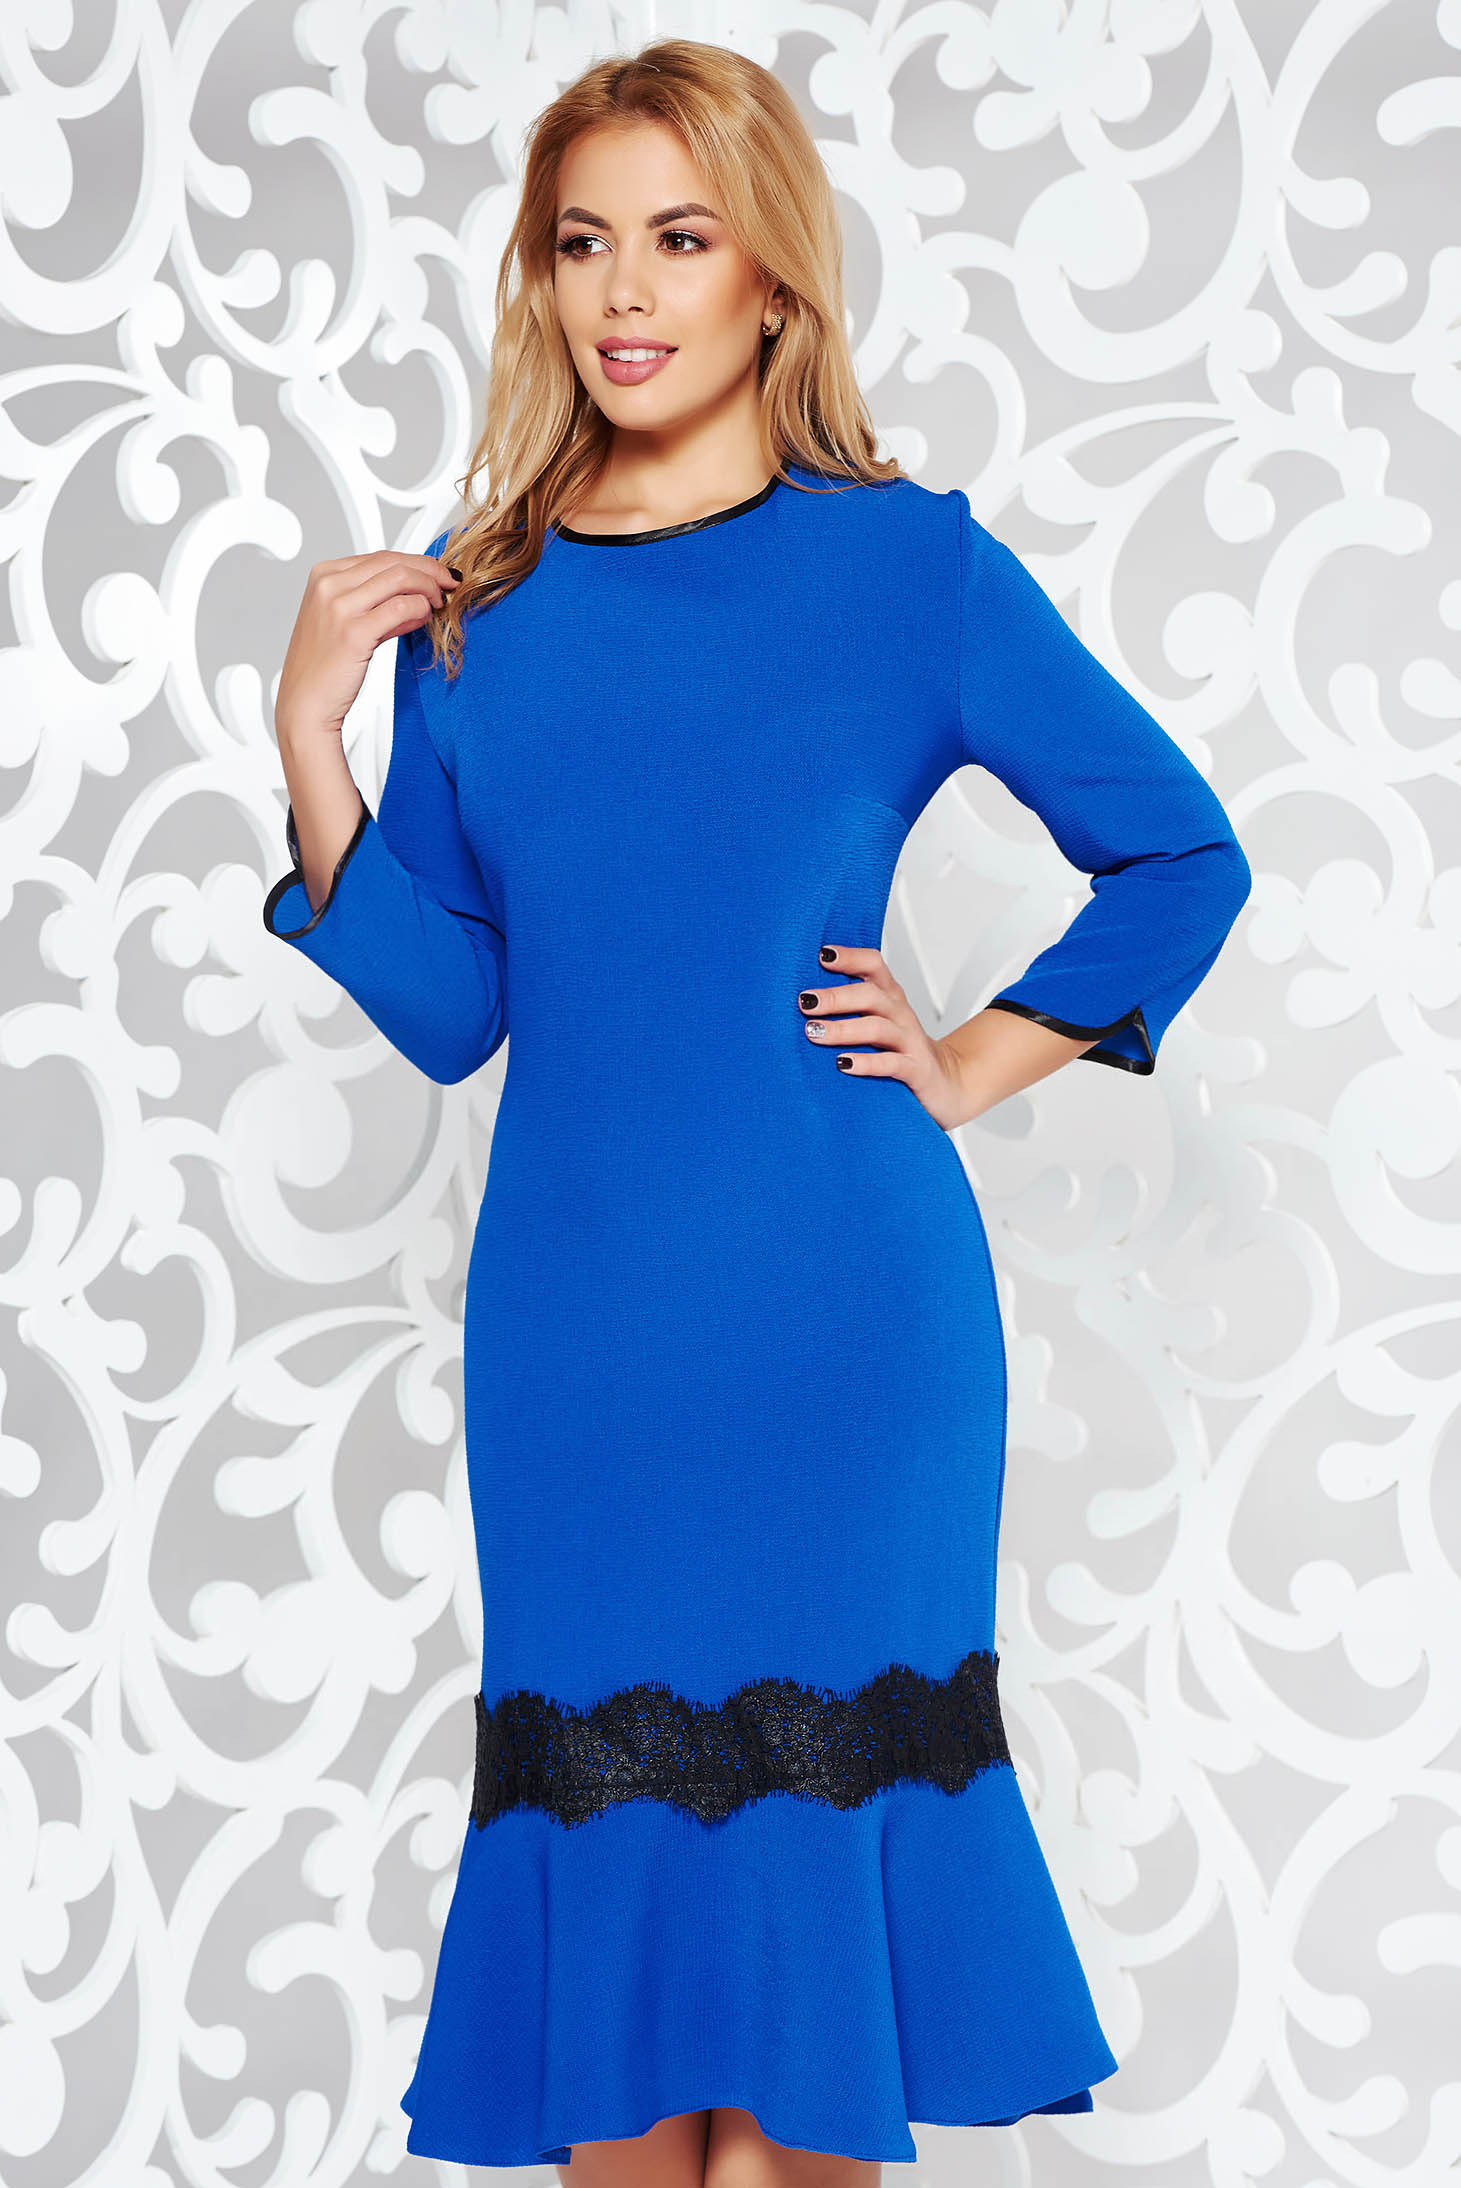 Rochie albastra eleganta midi din stofa usor elastica cu volanase la baza rochiei si aplicatii de dantela